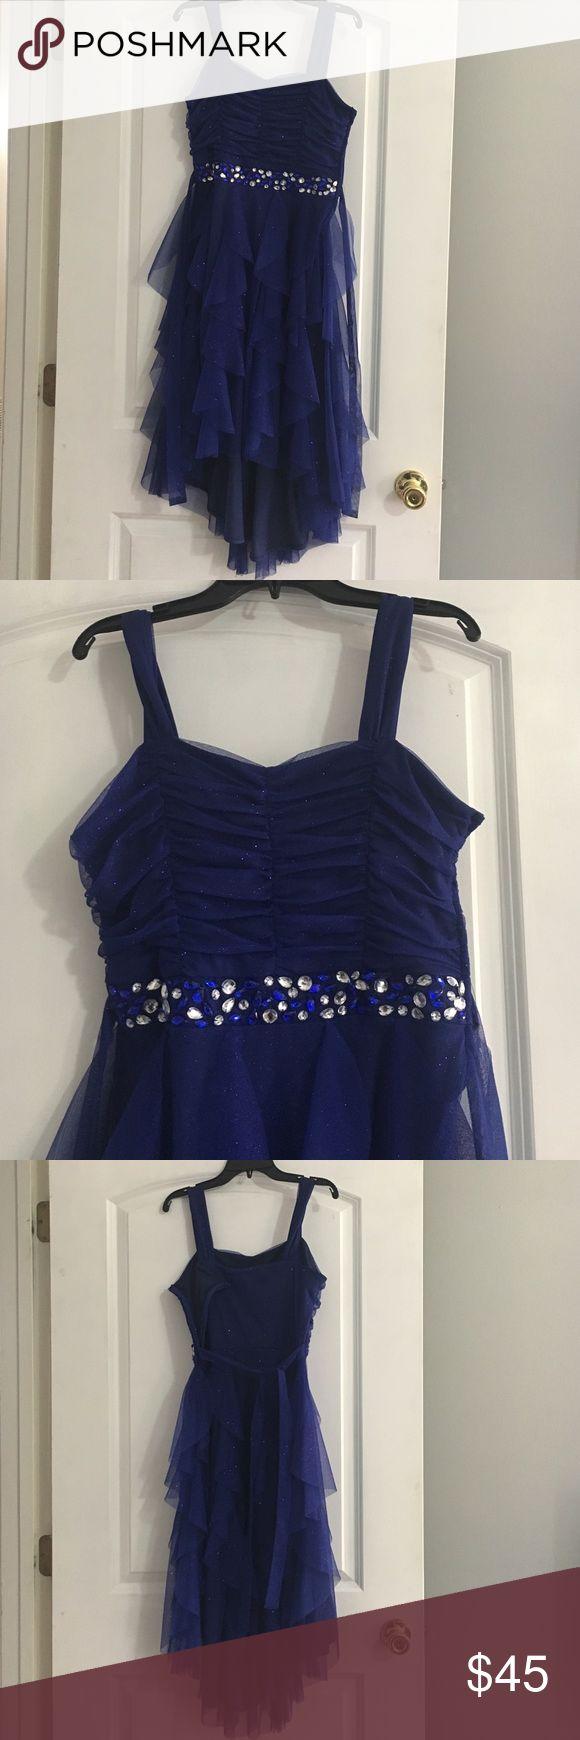 Gorgeous Royal Blue Dress Blue party dress with stone details. Side zip. Rear tie. Hi-Low style (back longer than front). Tween Diva Dresses Formal